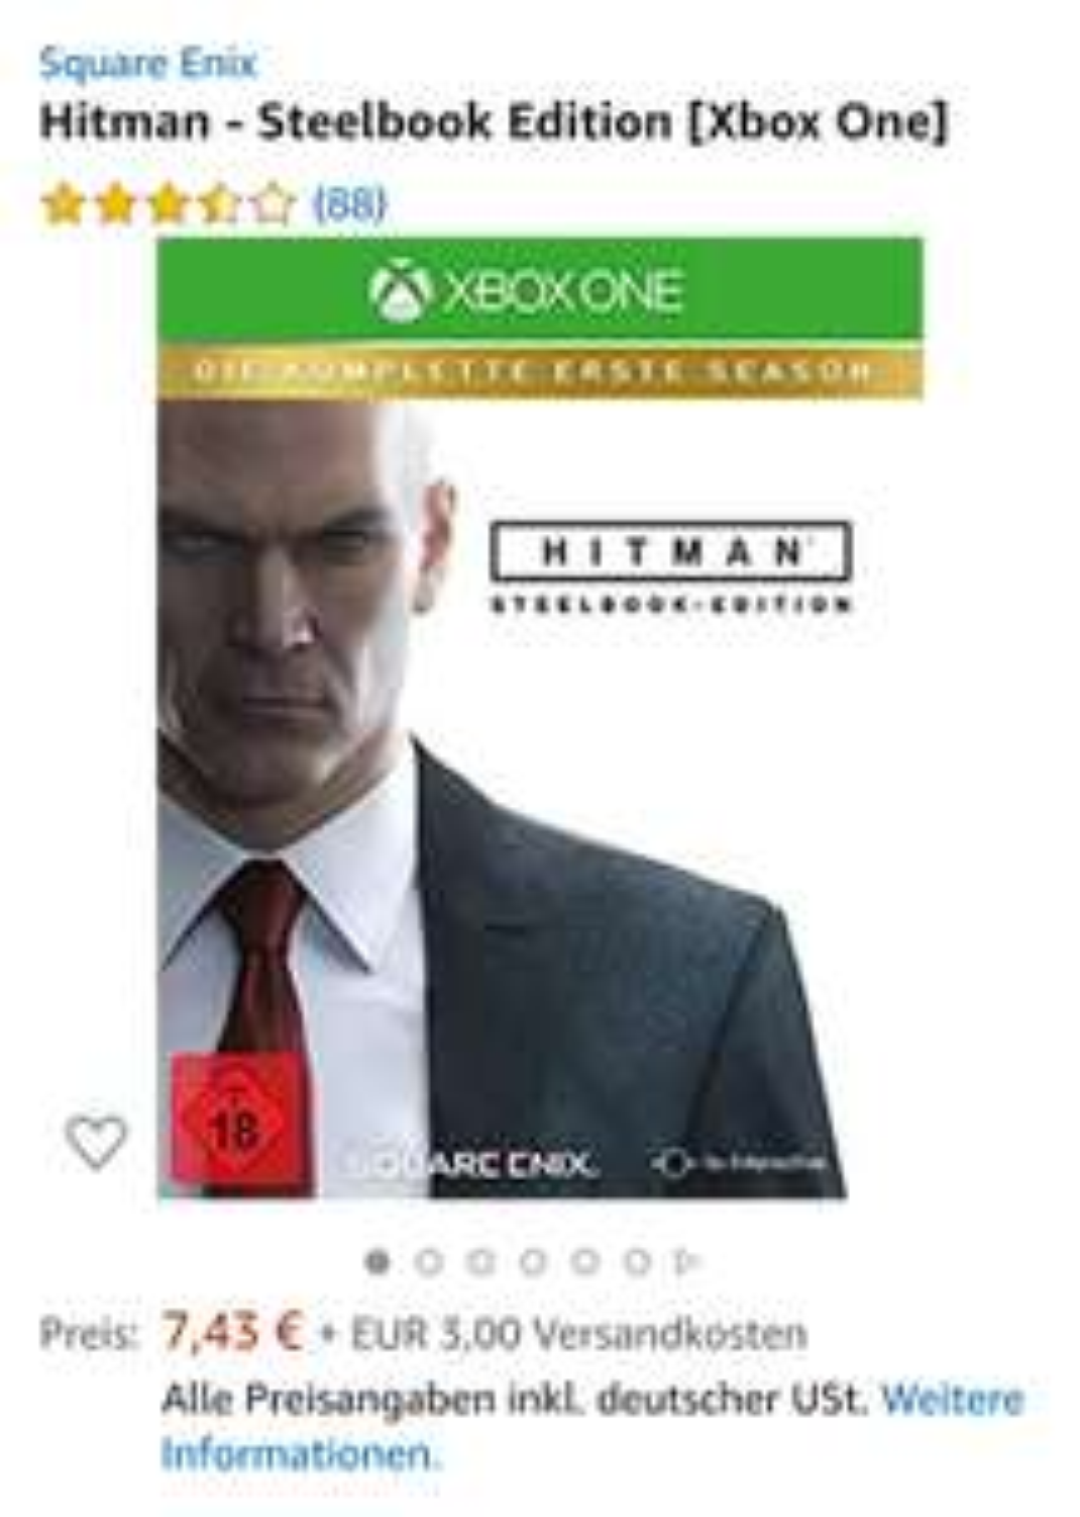 Hitman - Steelbook Edition - Xbox One